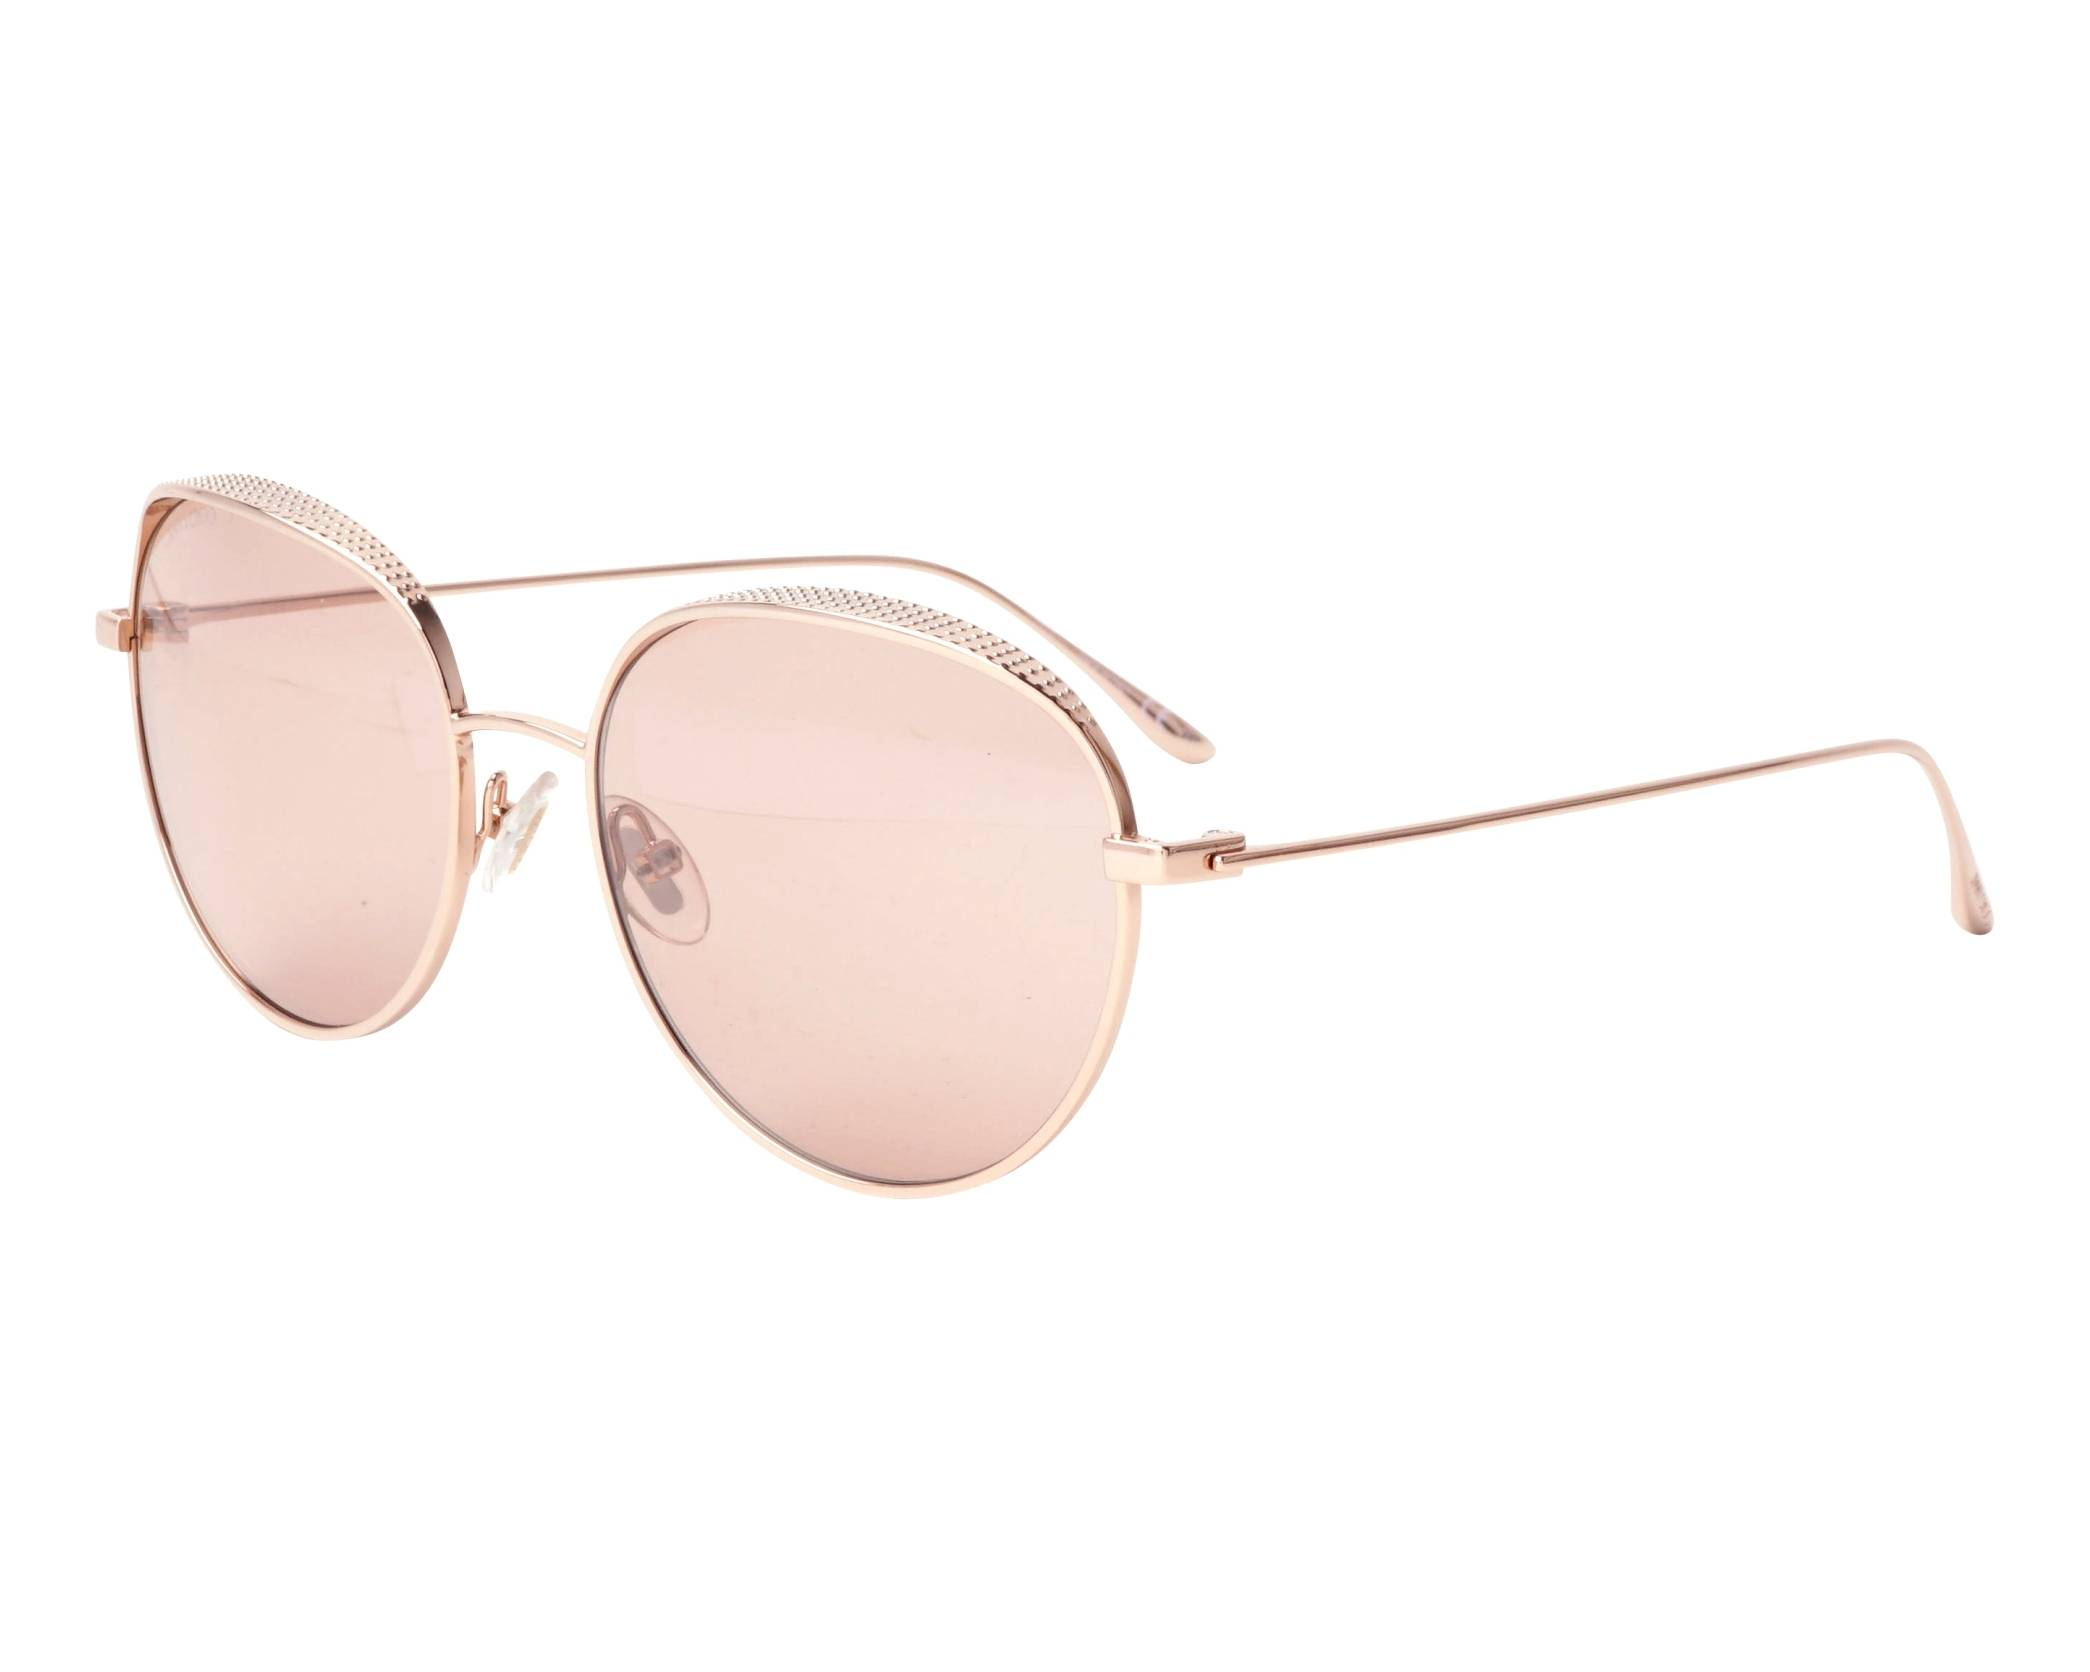 266739e78249 Sunglasses Jimmy Choo ELLO-S BKU2S 56-18 Rose gold profile view